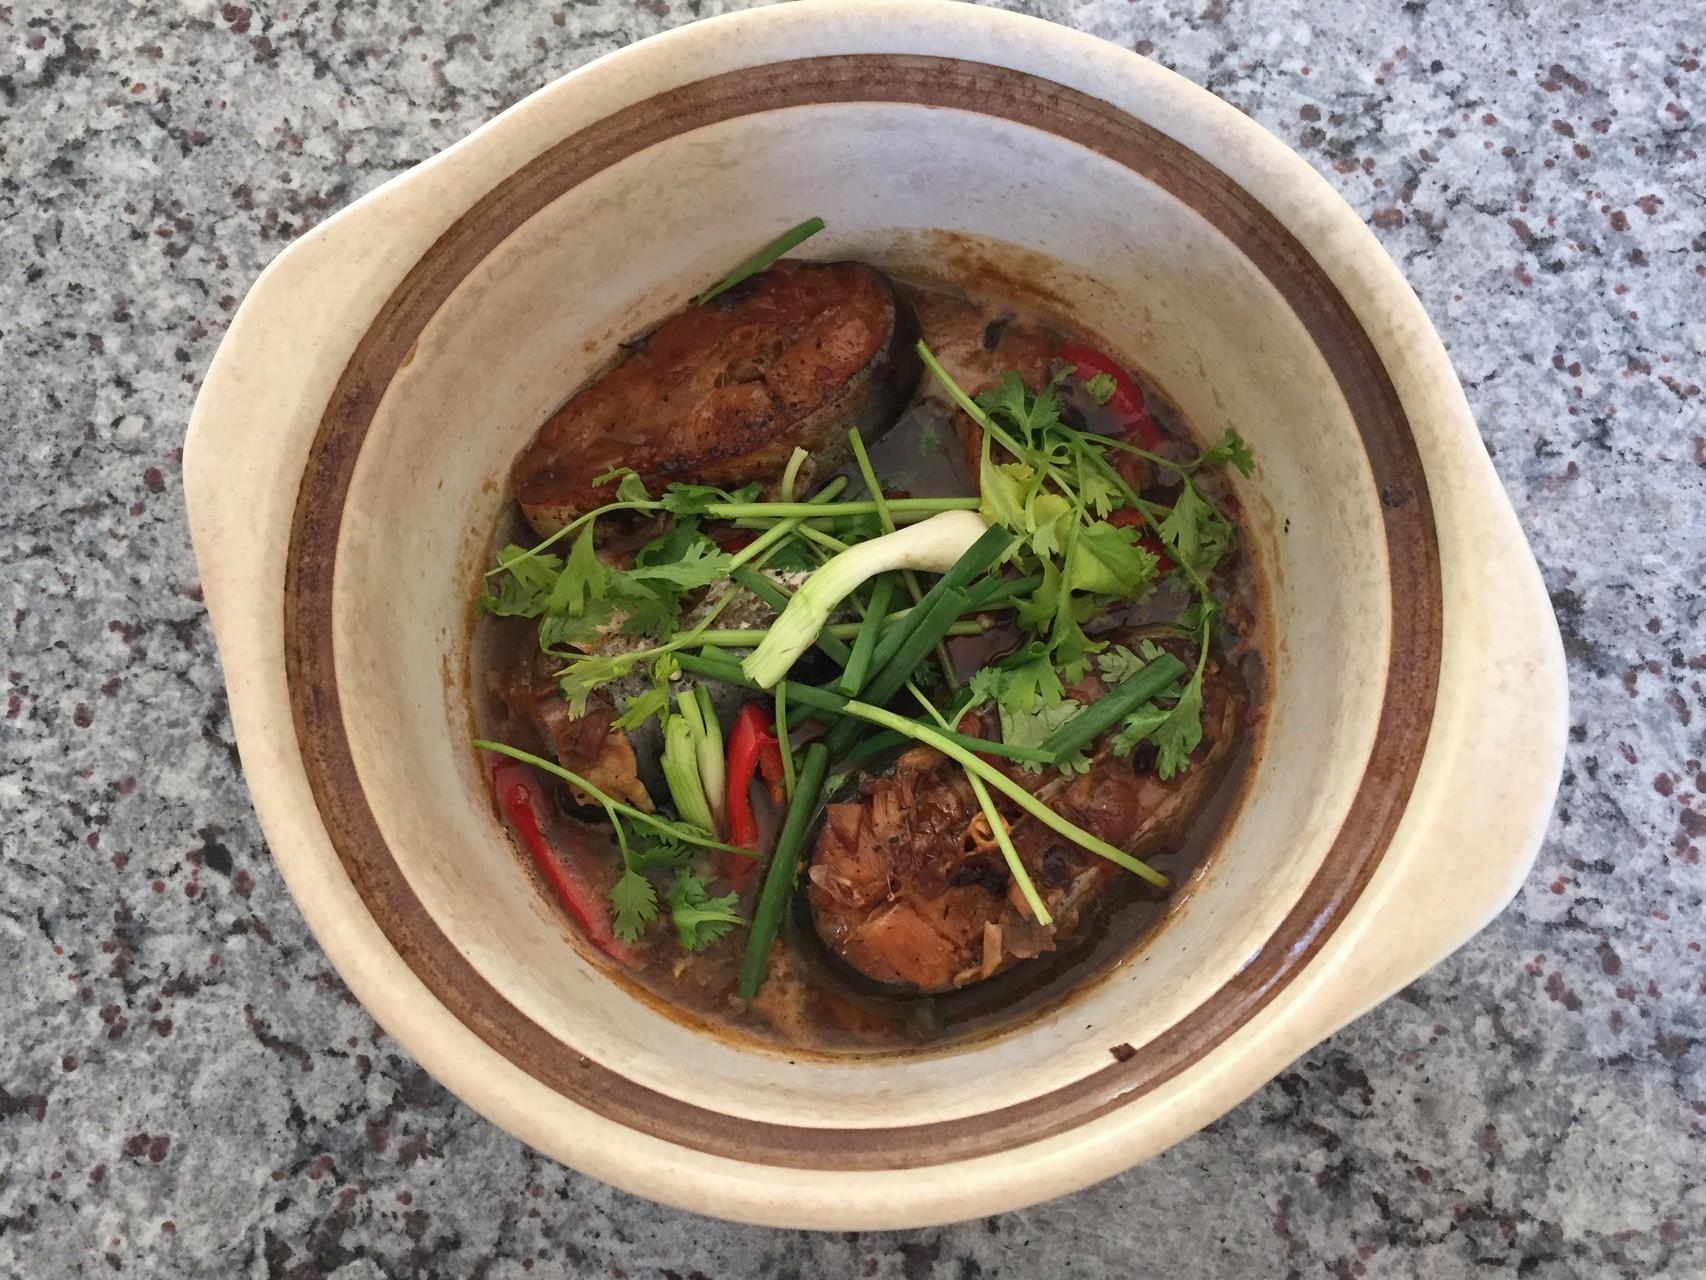 Ca kho to - feiner gekochter Pangasiusstück im heisse Topf